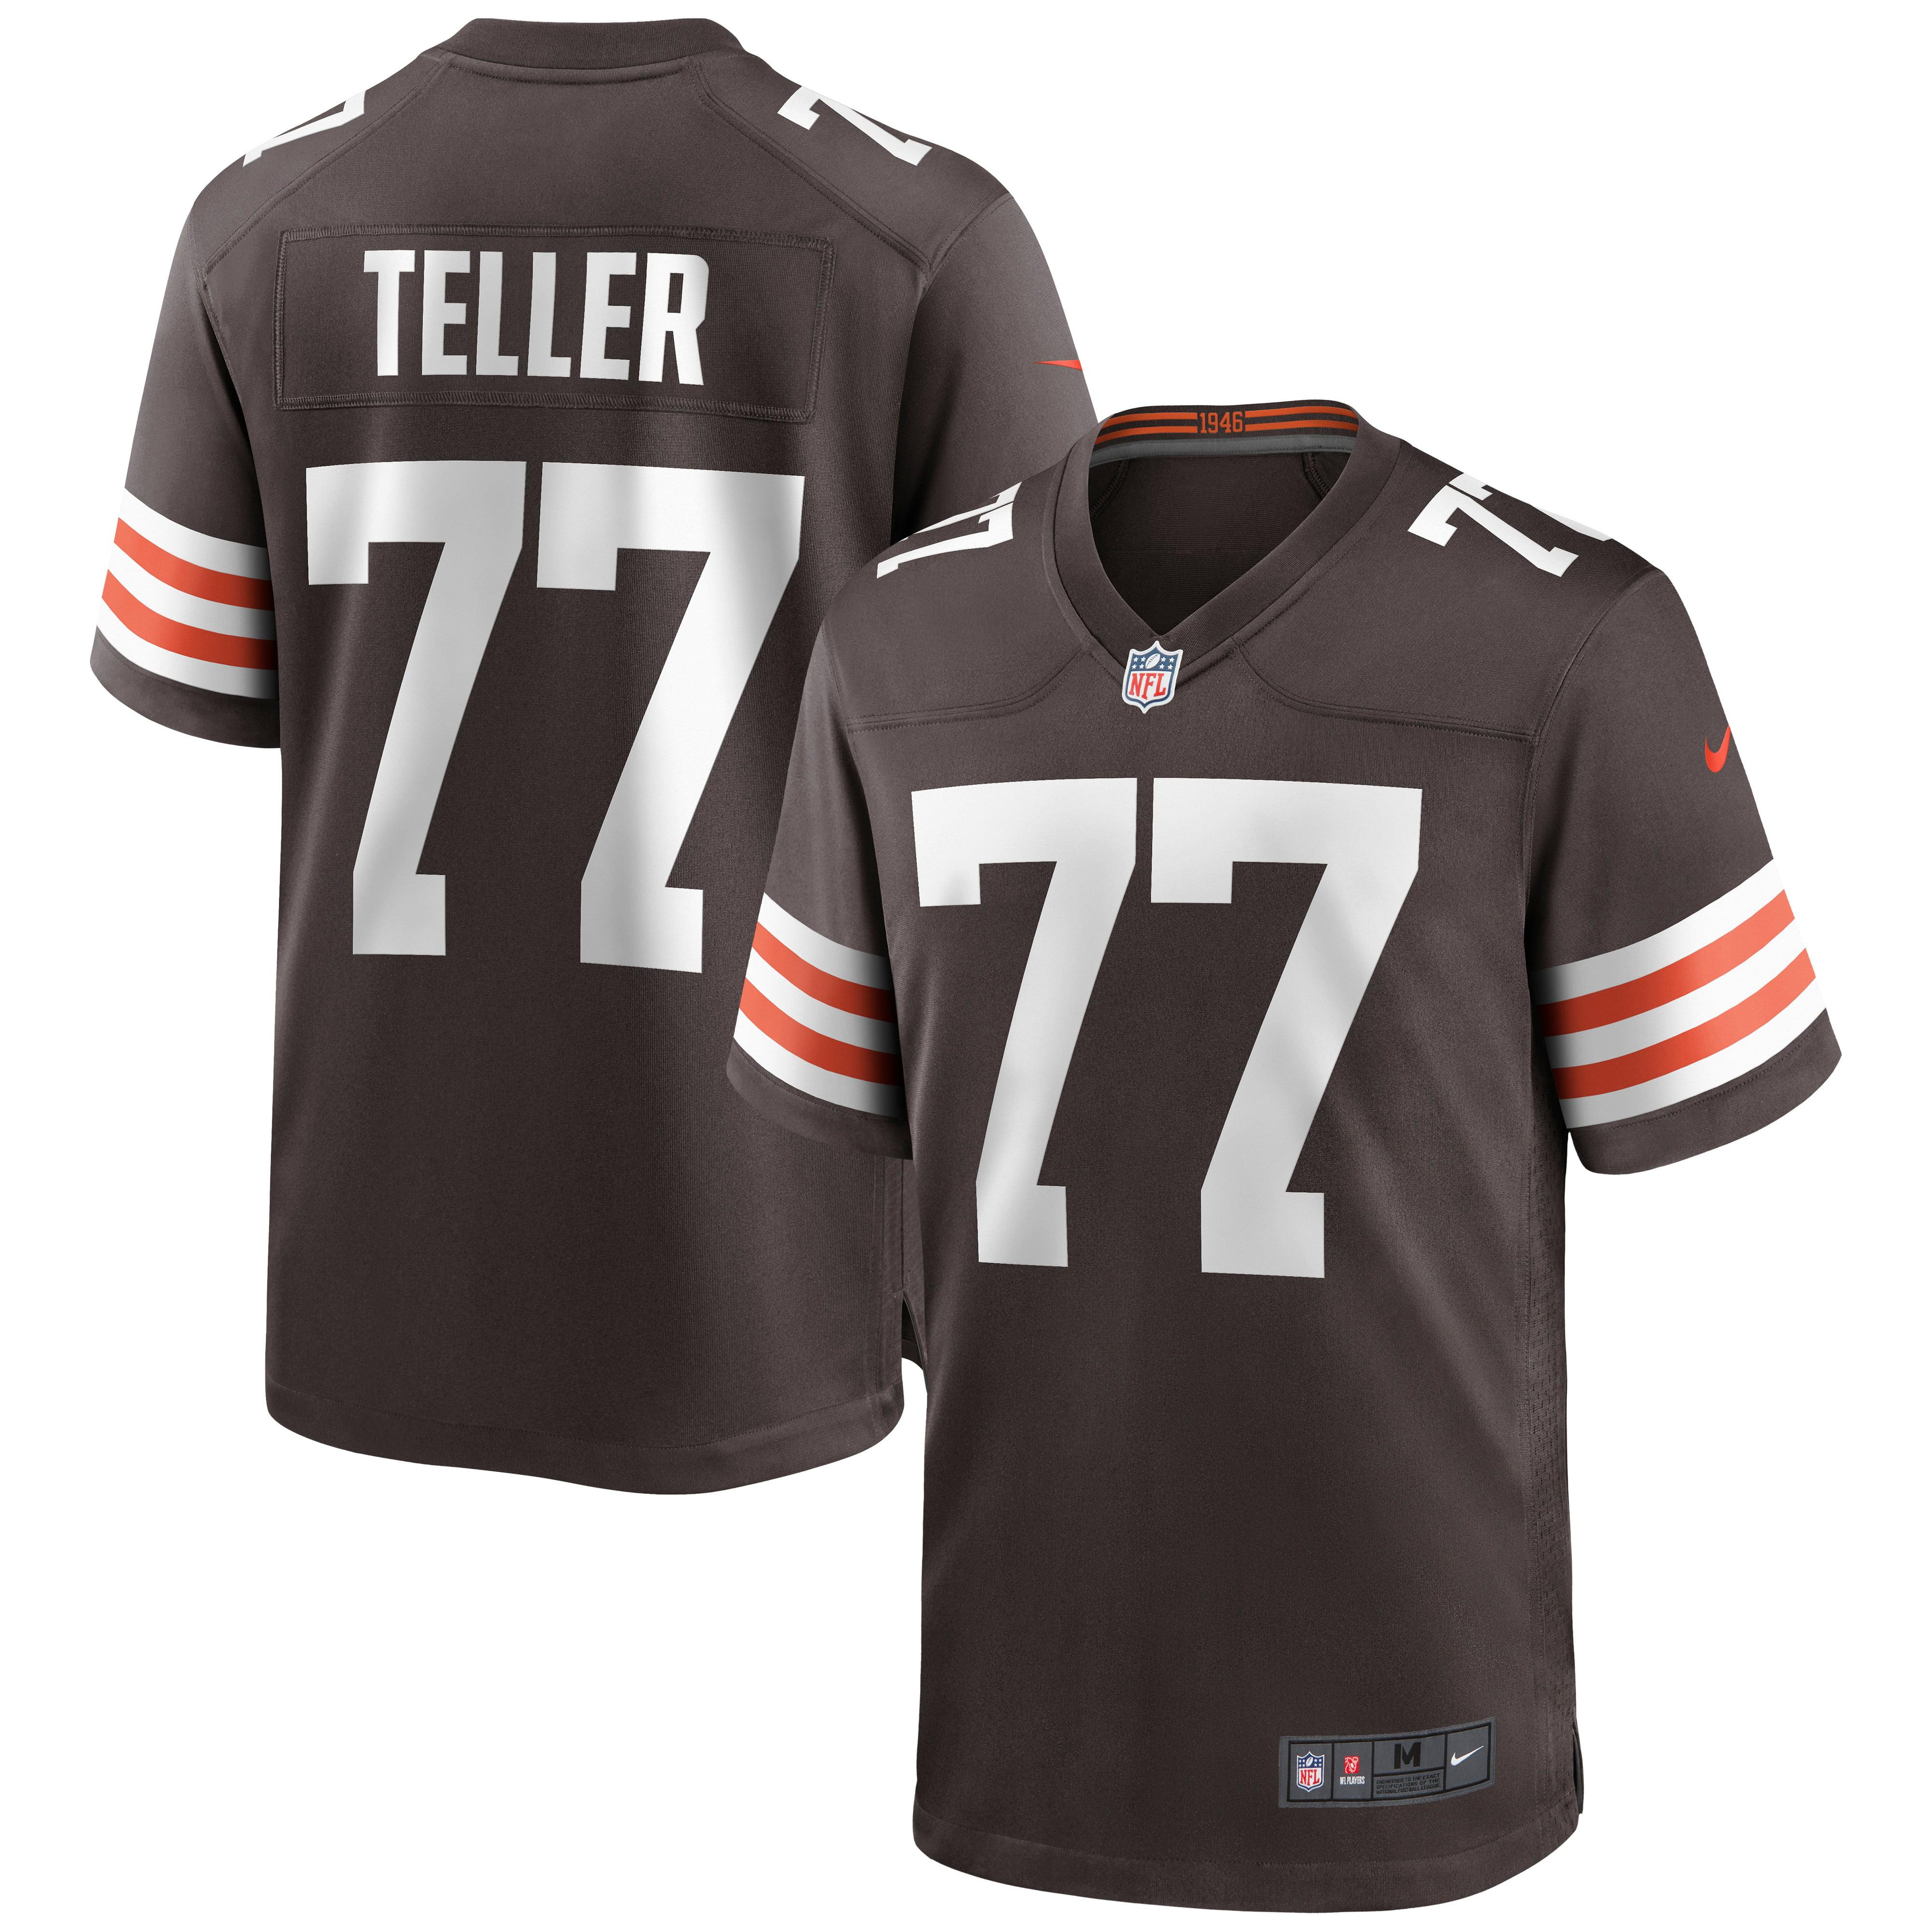 Wyatt Teller Cleveland Browns Nike Game Jersey - Brown - Walmart.com